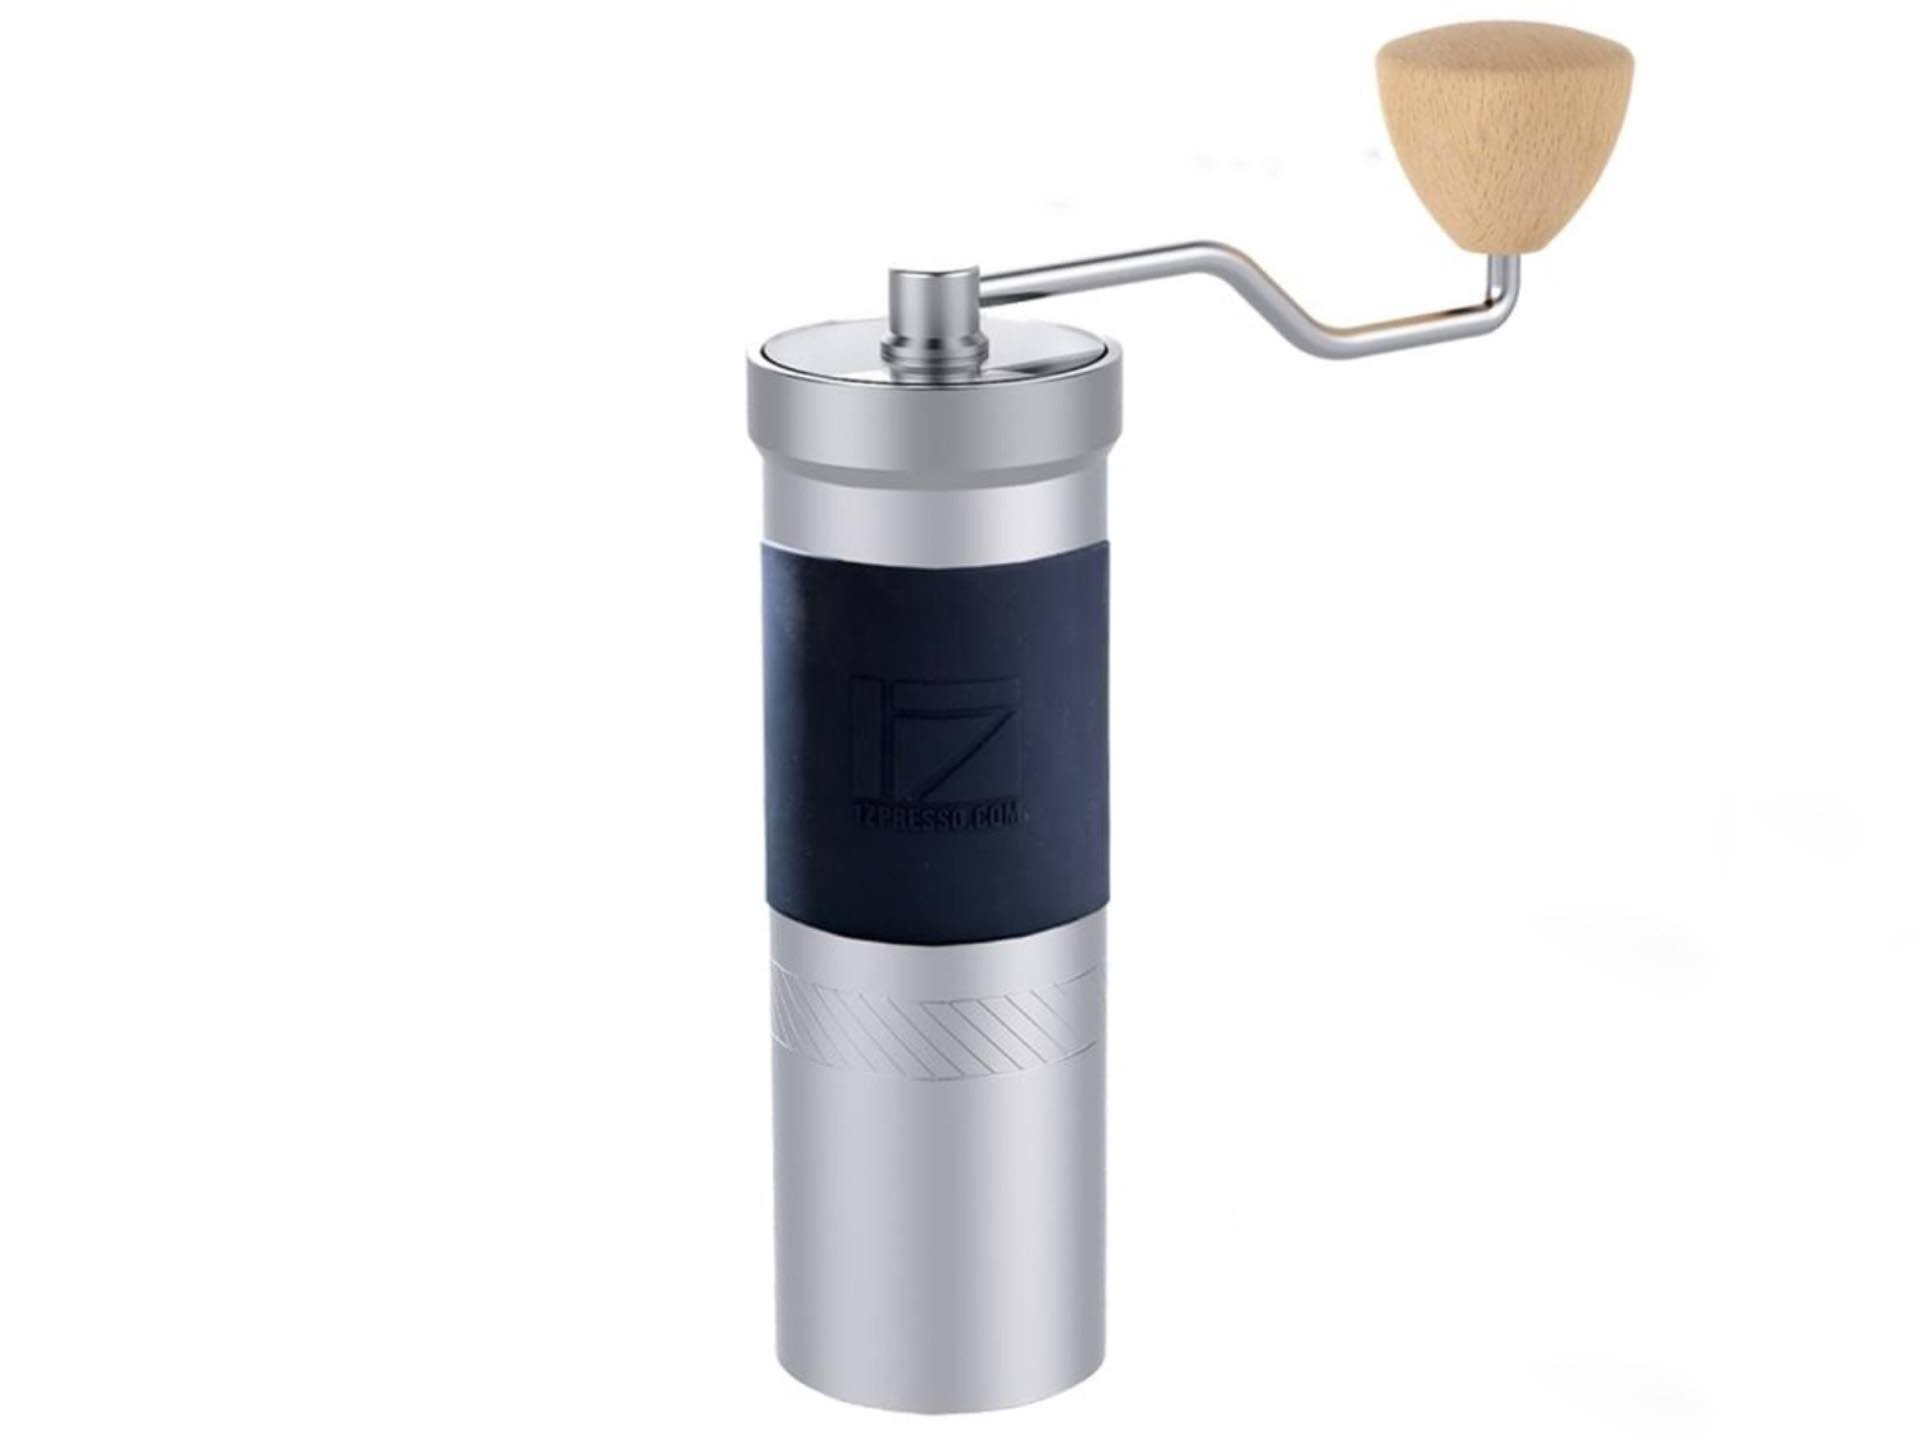 1Zpresso JX-Pro manual espresso grinder. ($159)